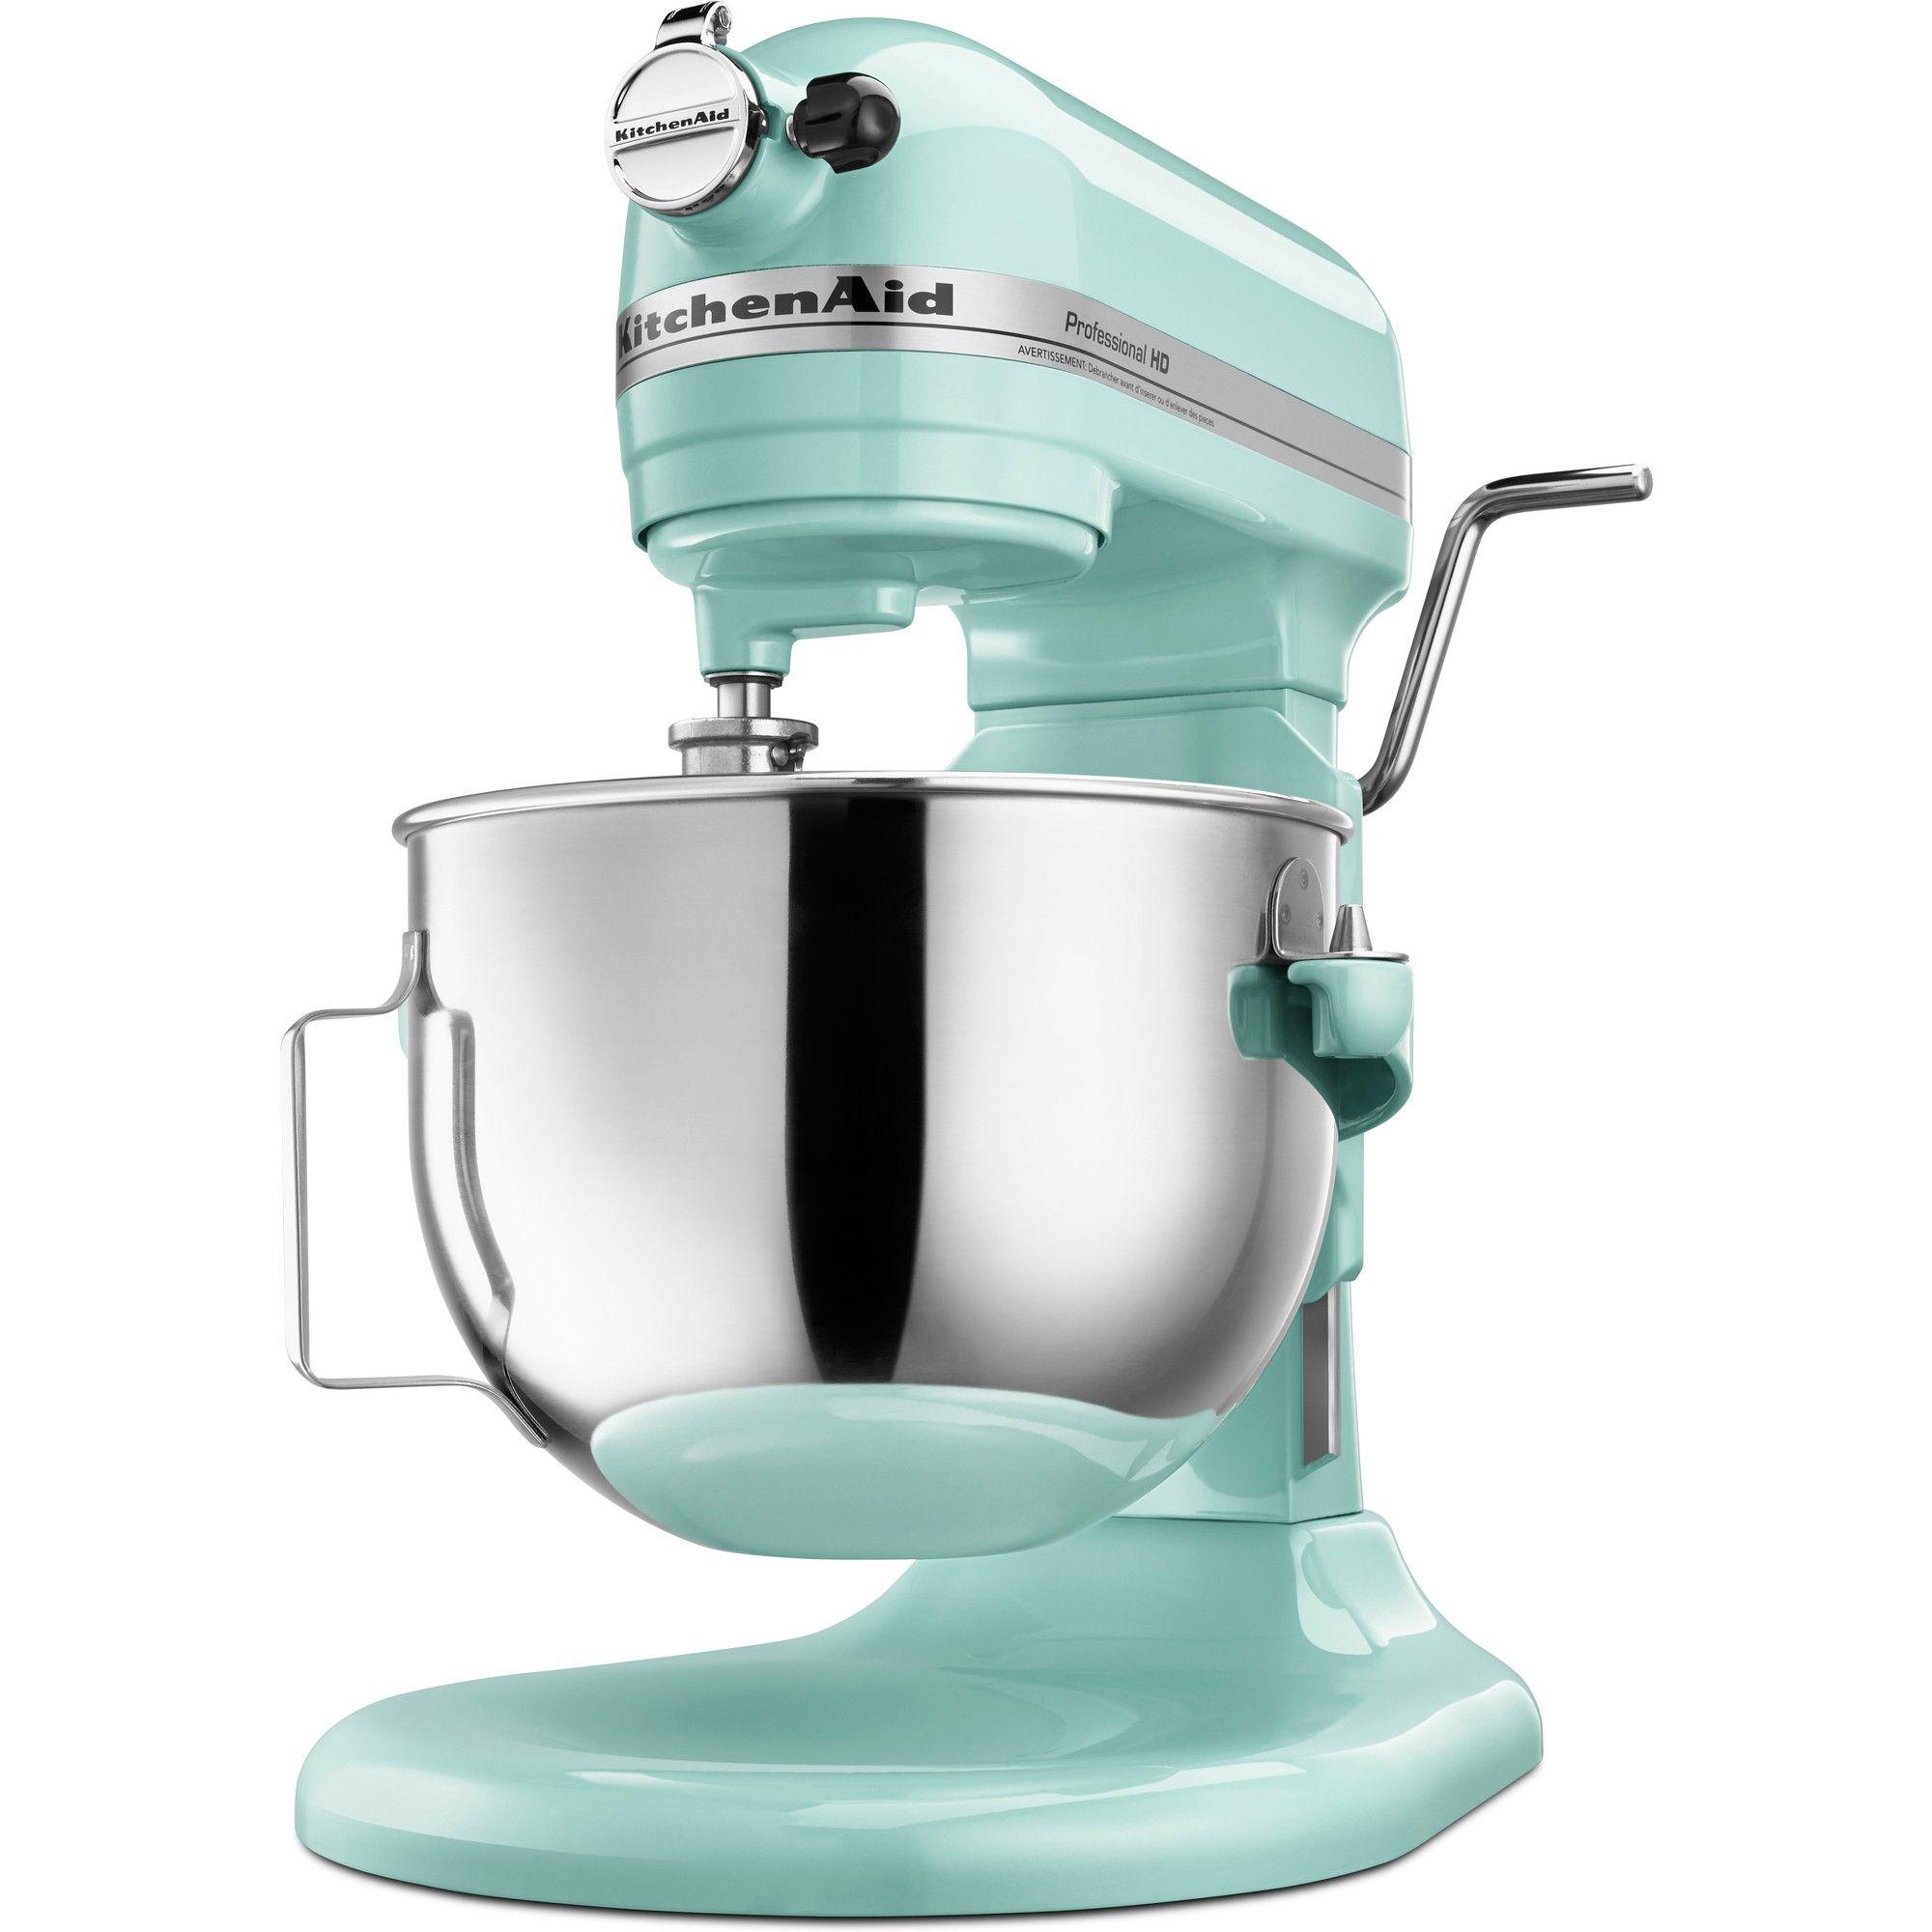 Kitchenaid Refurbished 5qt Bowl Lift Stand Mixer Ice White Rkg25h0xic Kitchen Aid